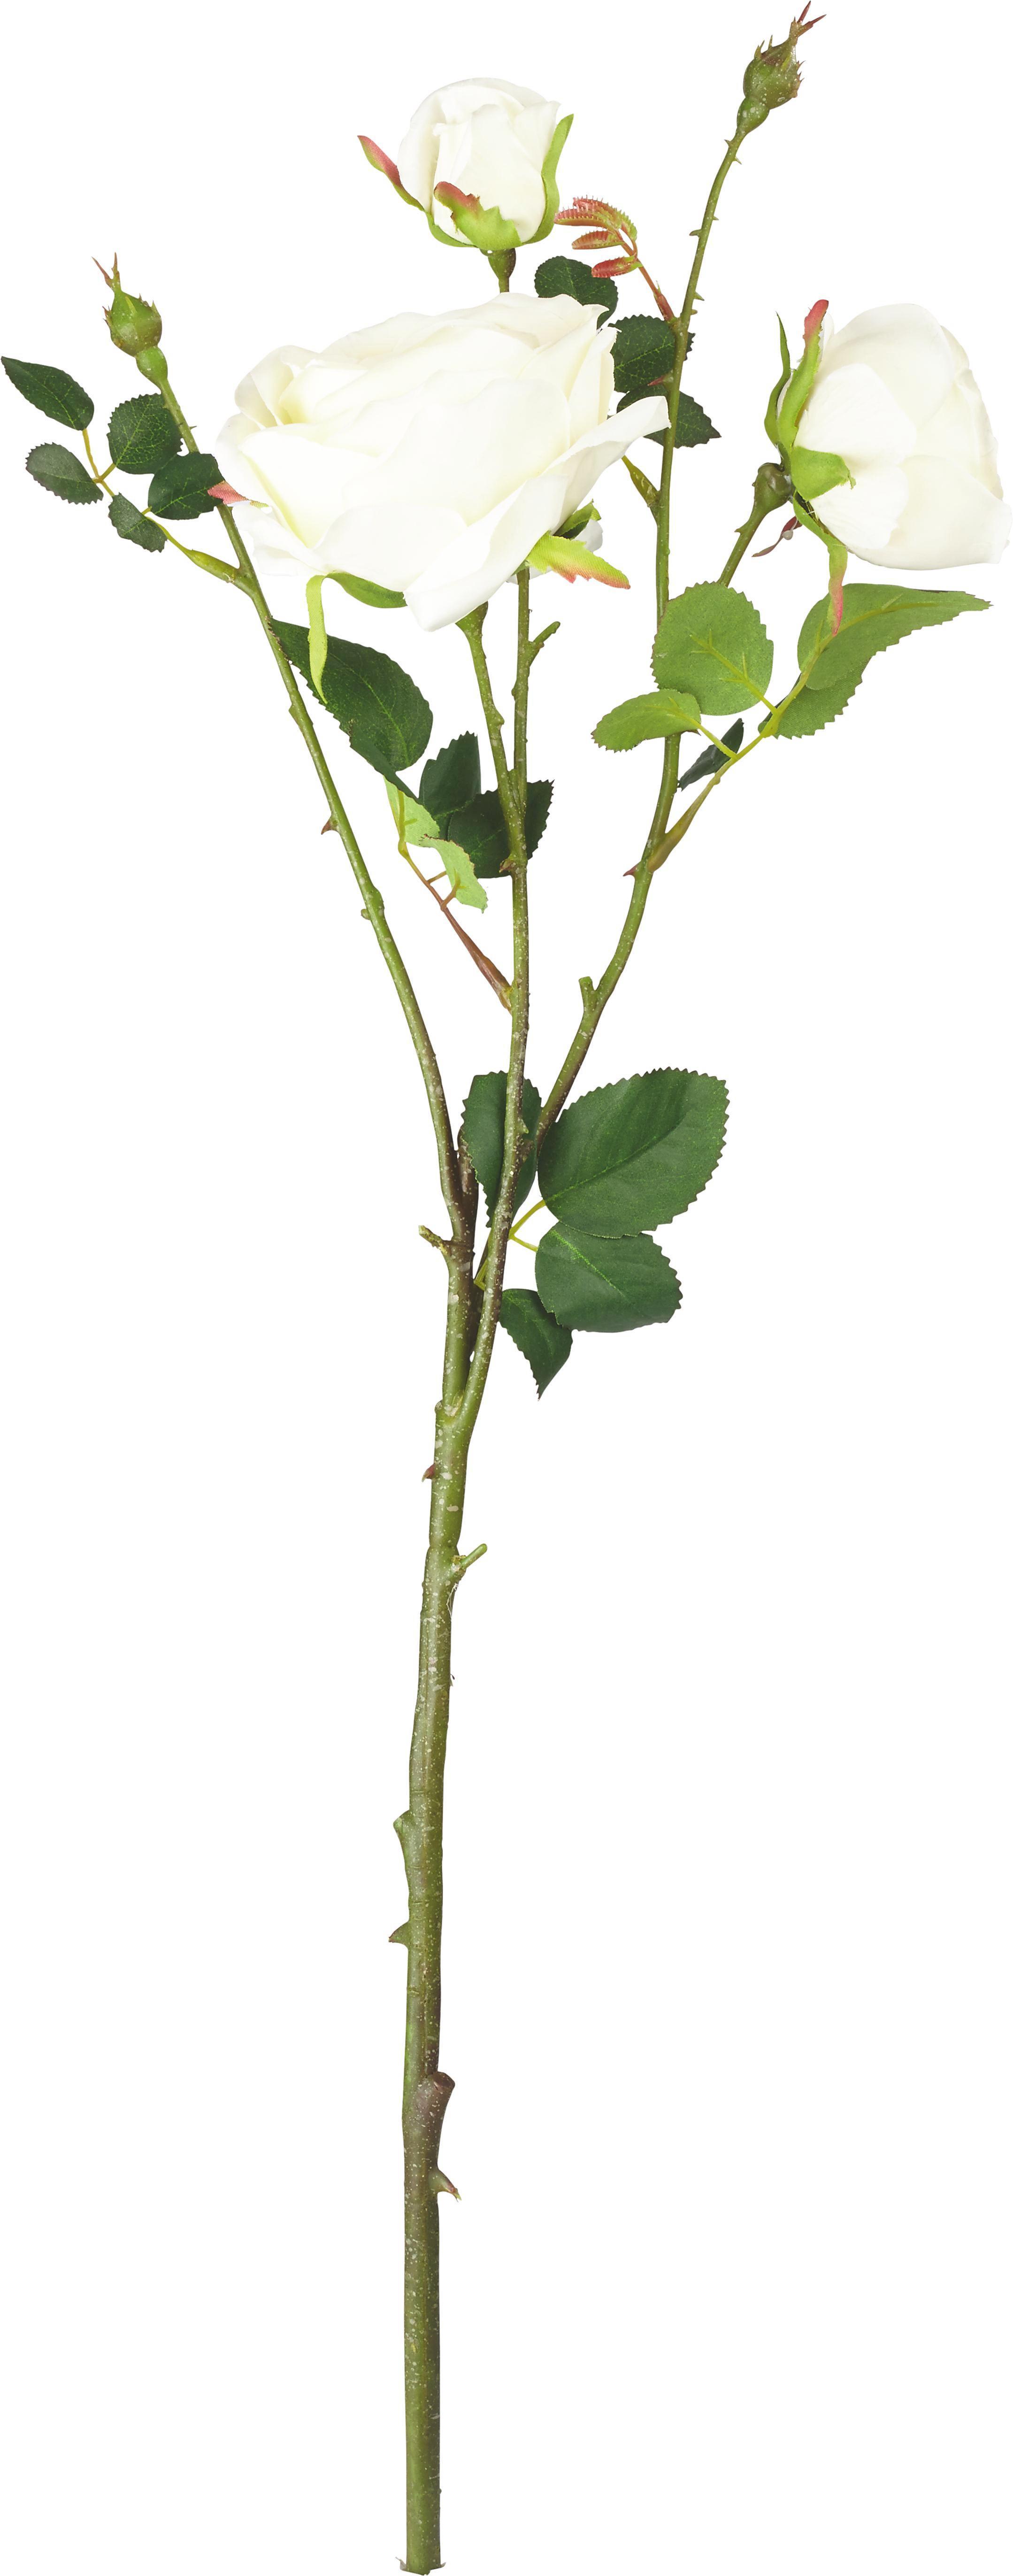 Rózsa Rosa - krém/zöld, műanyag/textil (63cm) - MÖMAX modern living